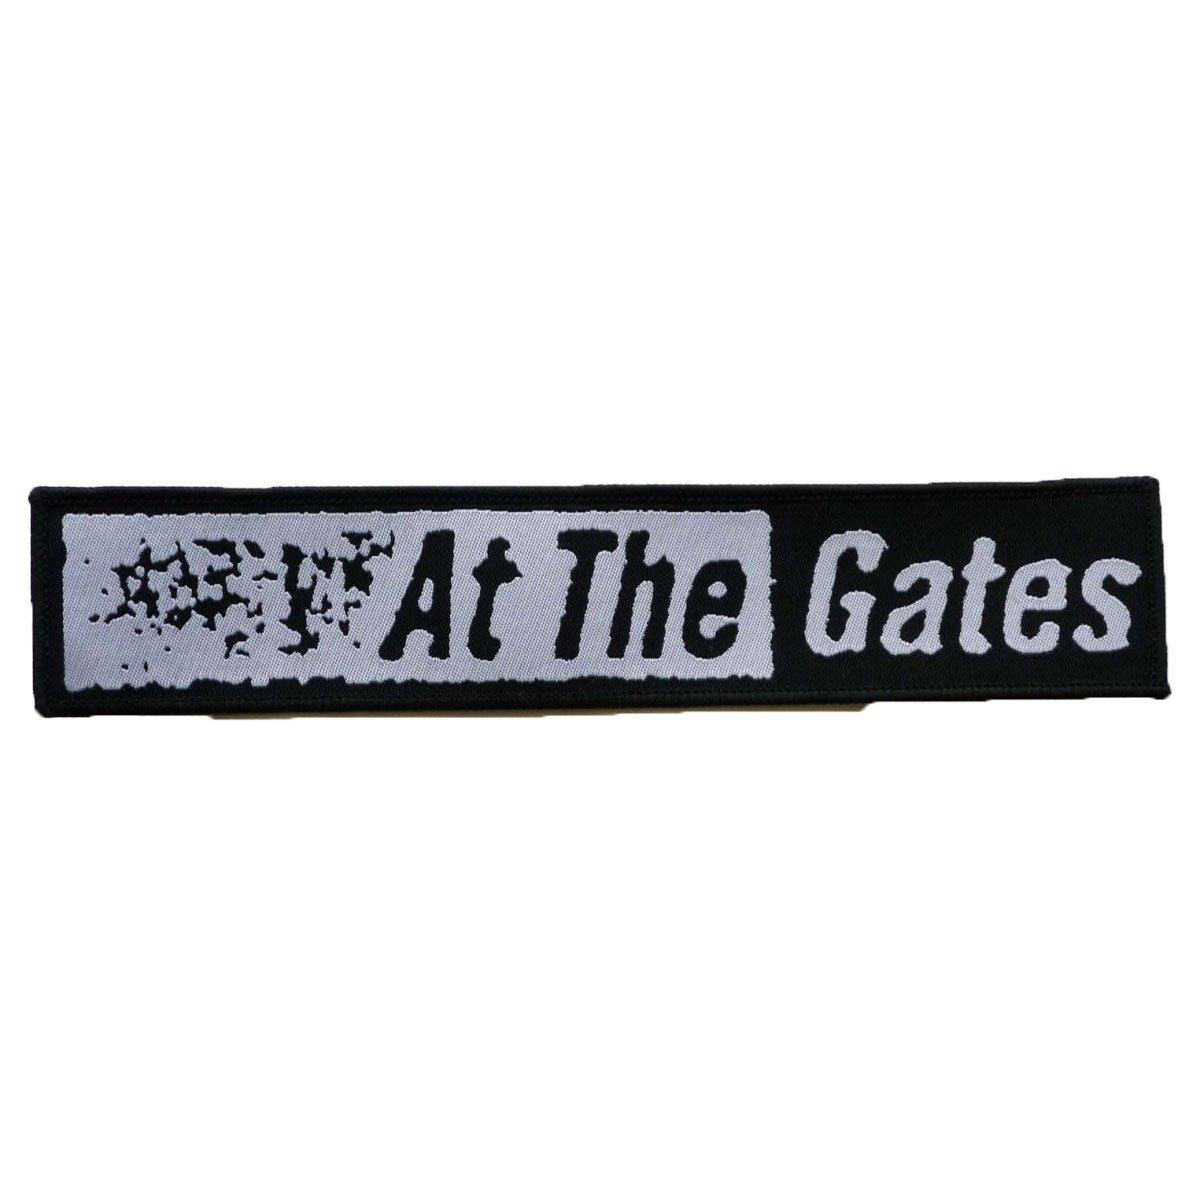 At The Gates.